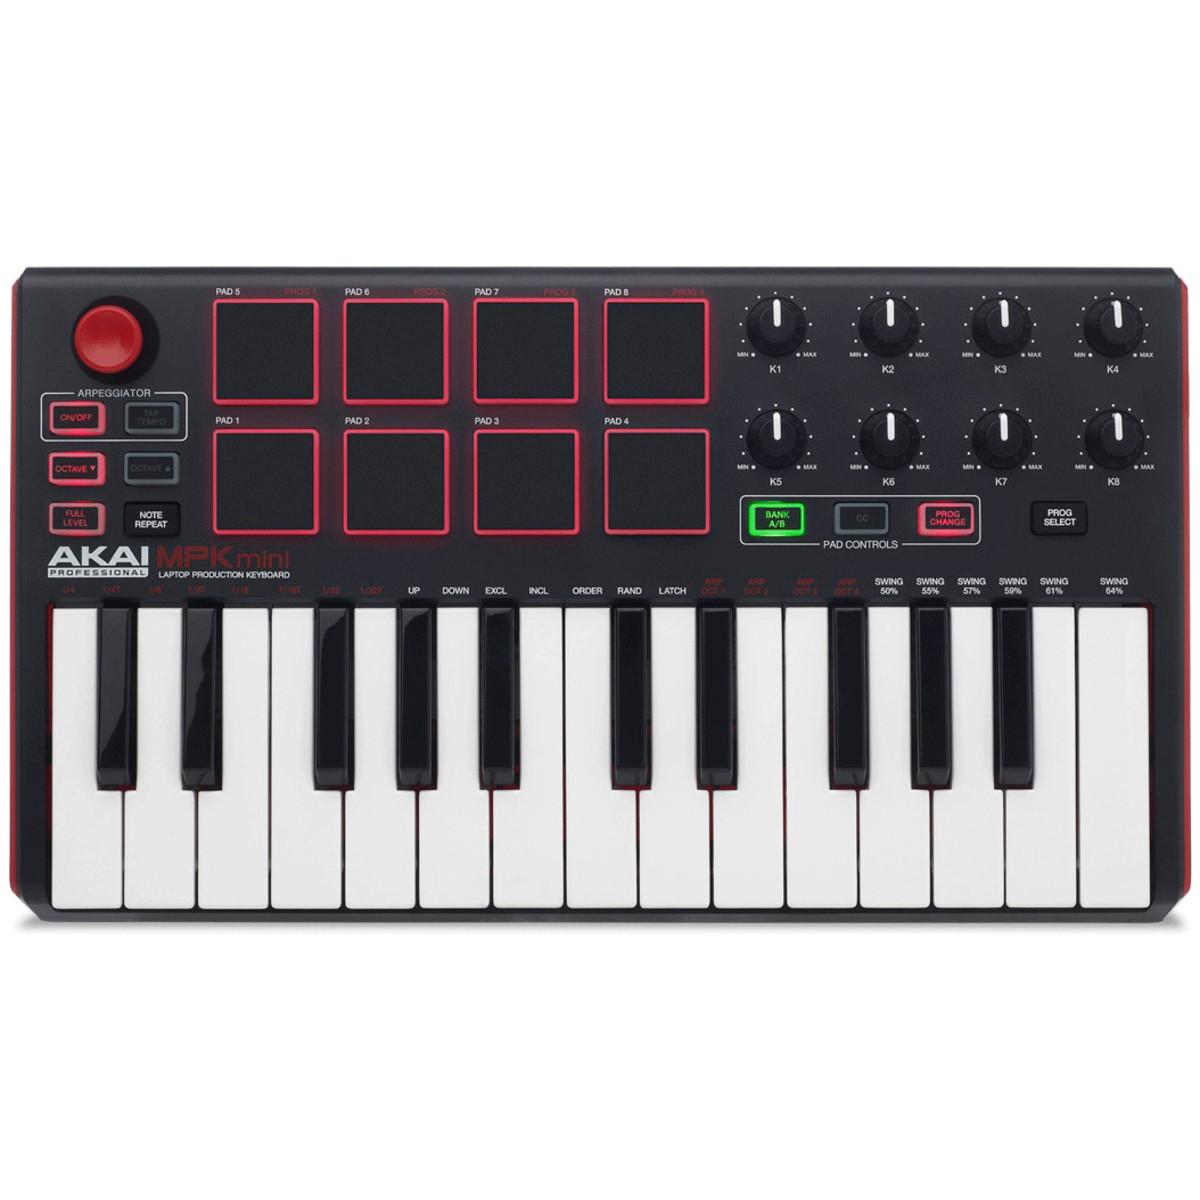 Akai MPK Mini MK 2 Laptop Production Keyboard